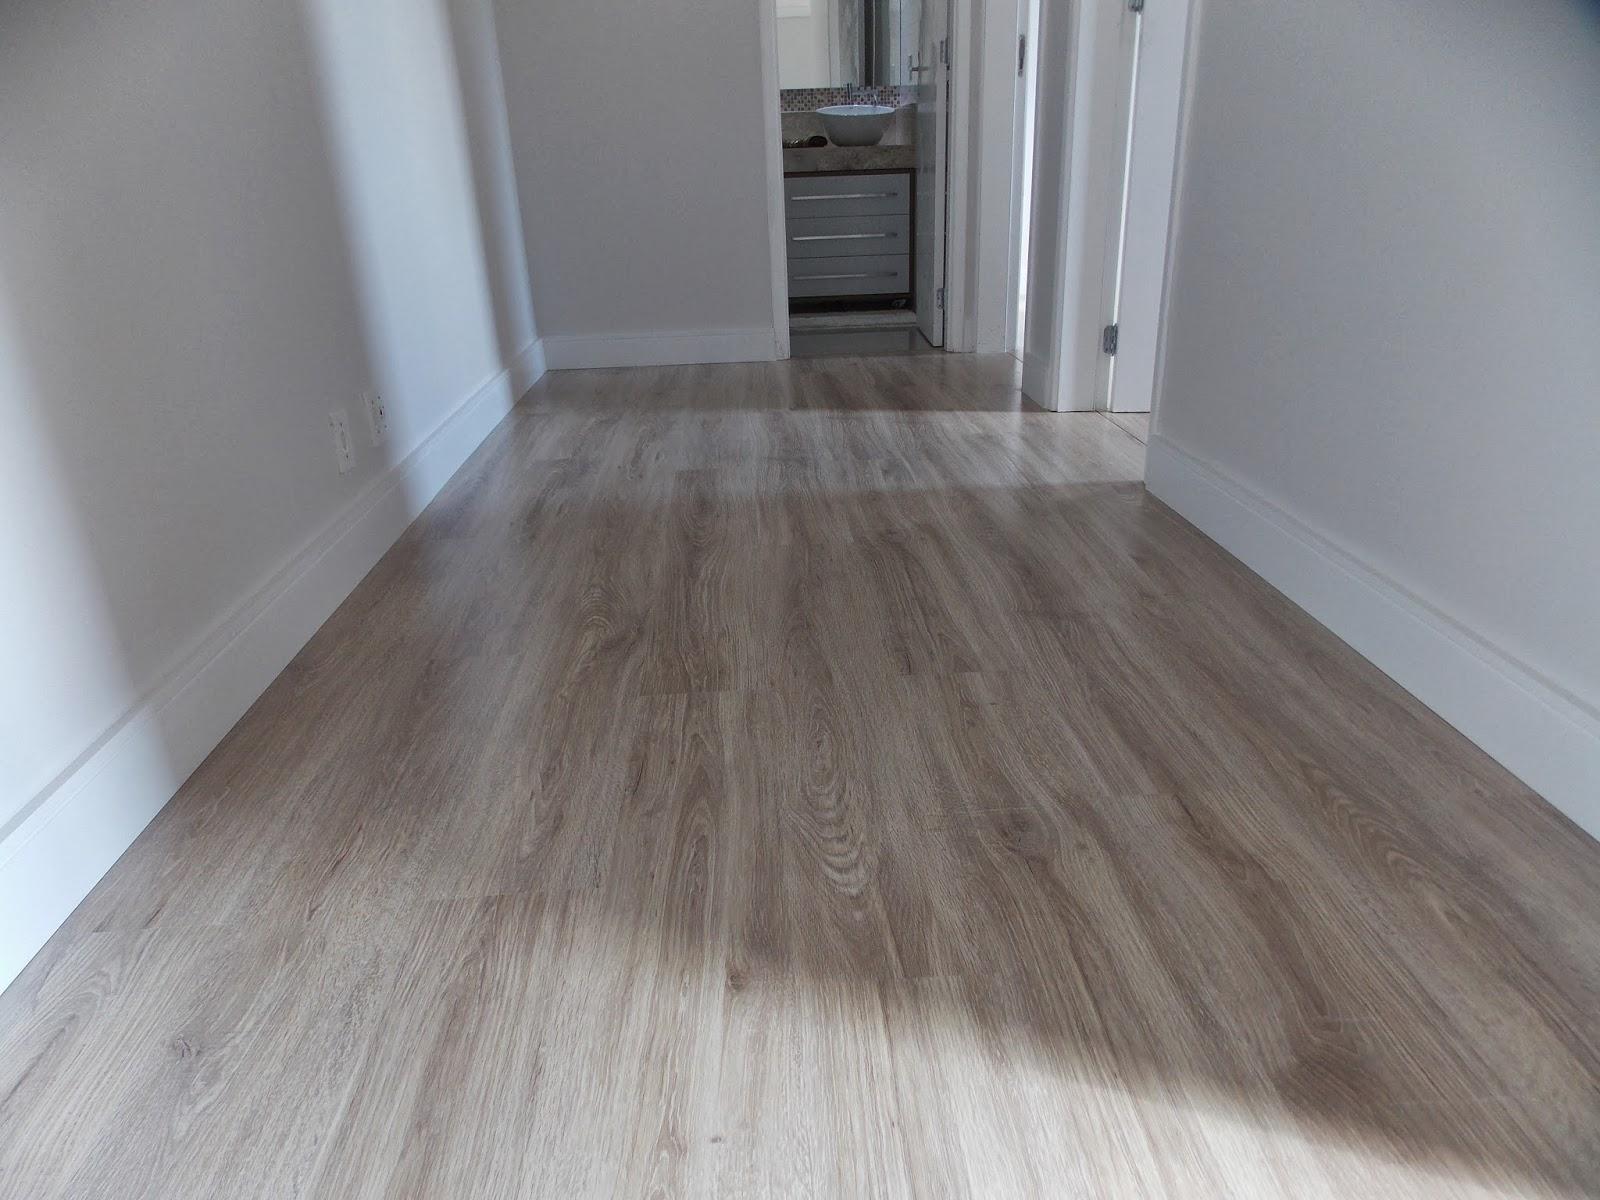 Loucos do 14!!: Nosso piso laminado! #556576 1600 1200